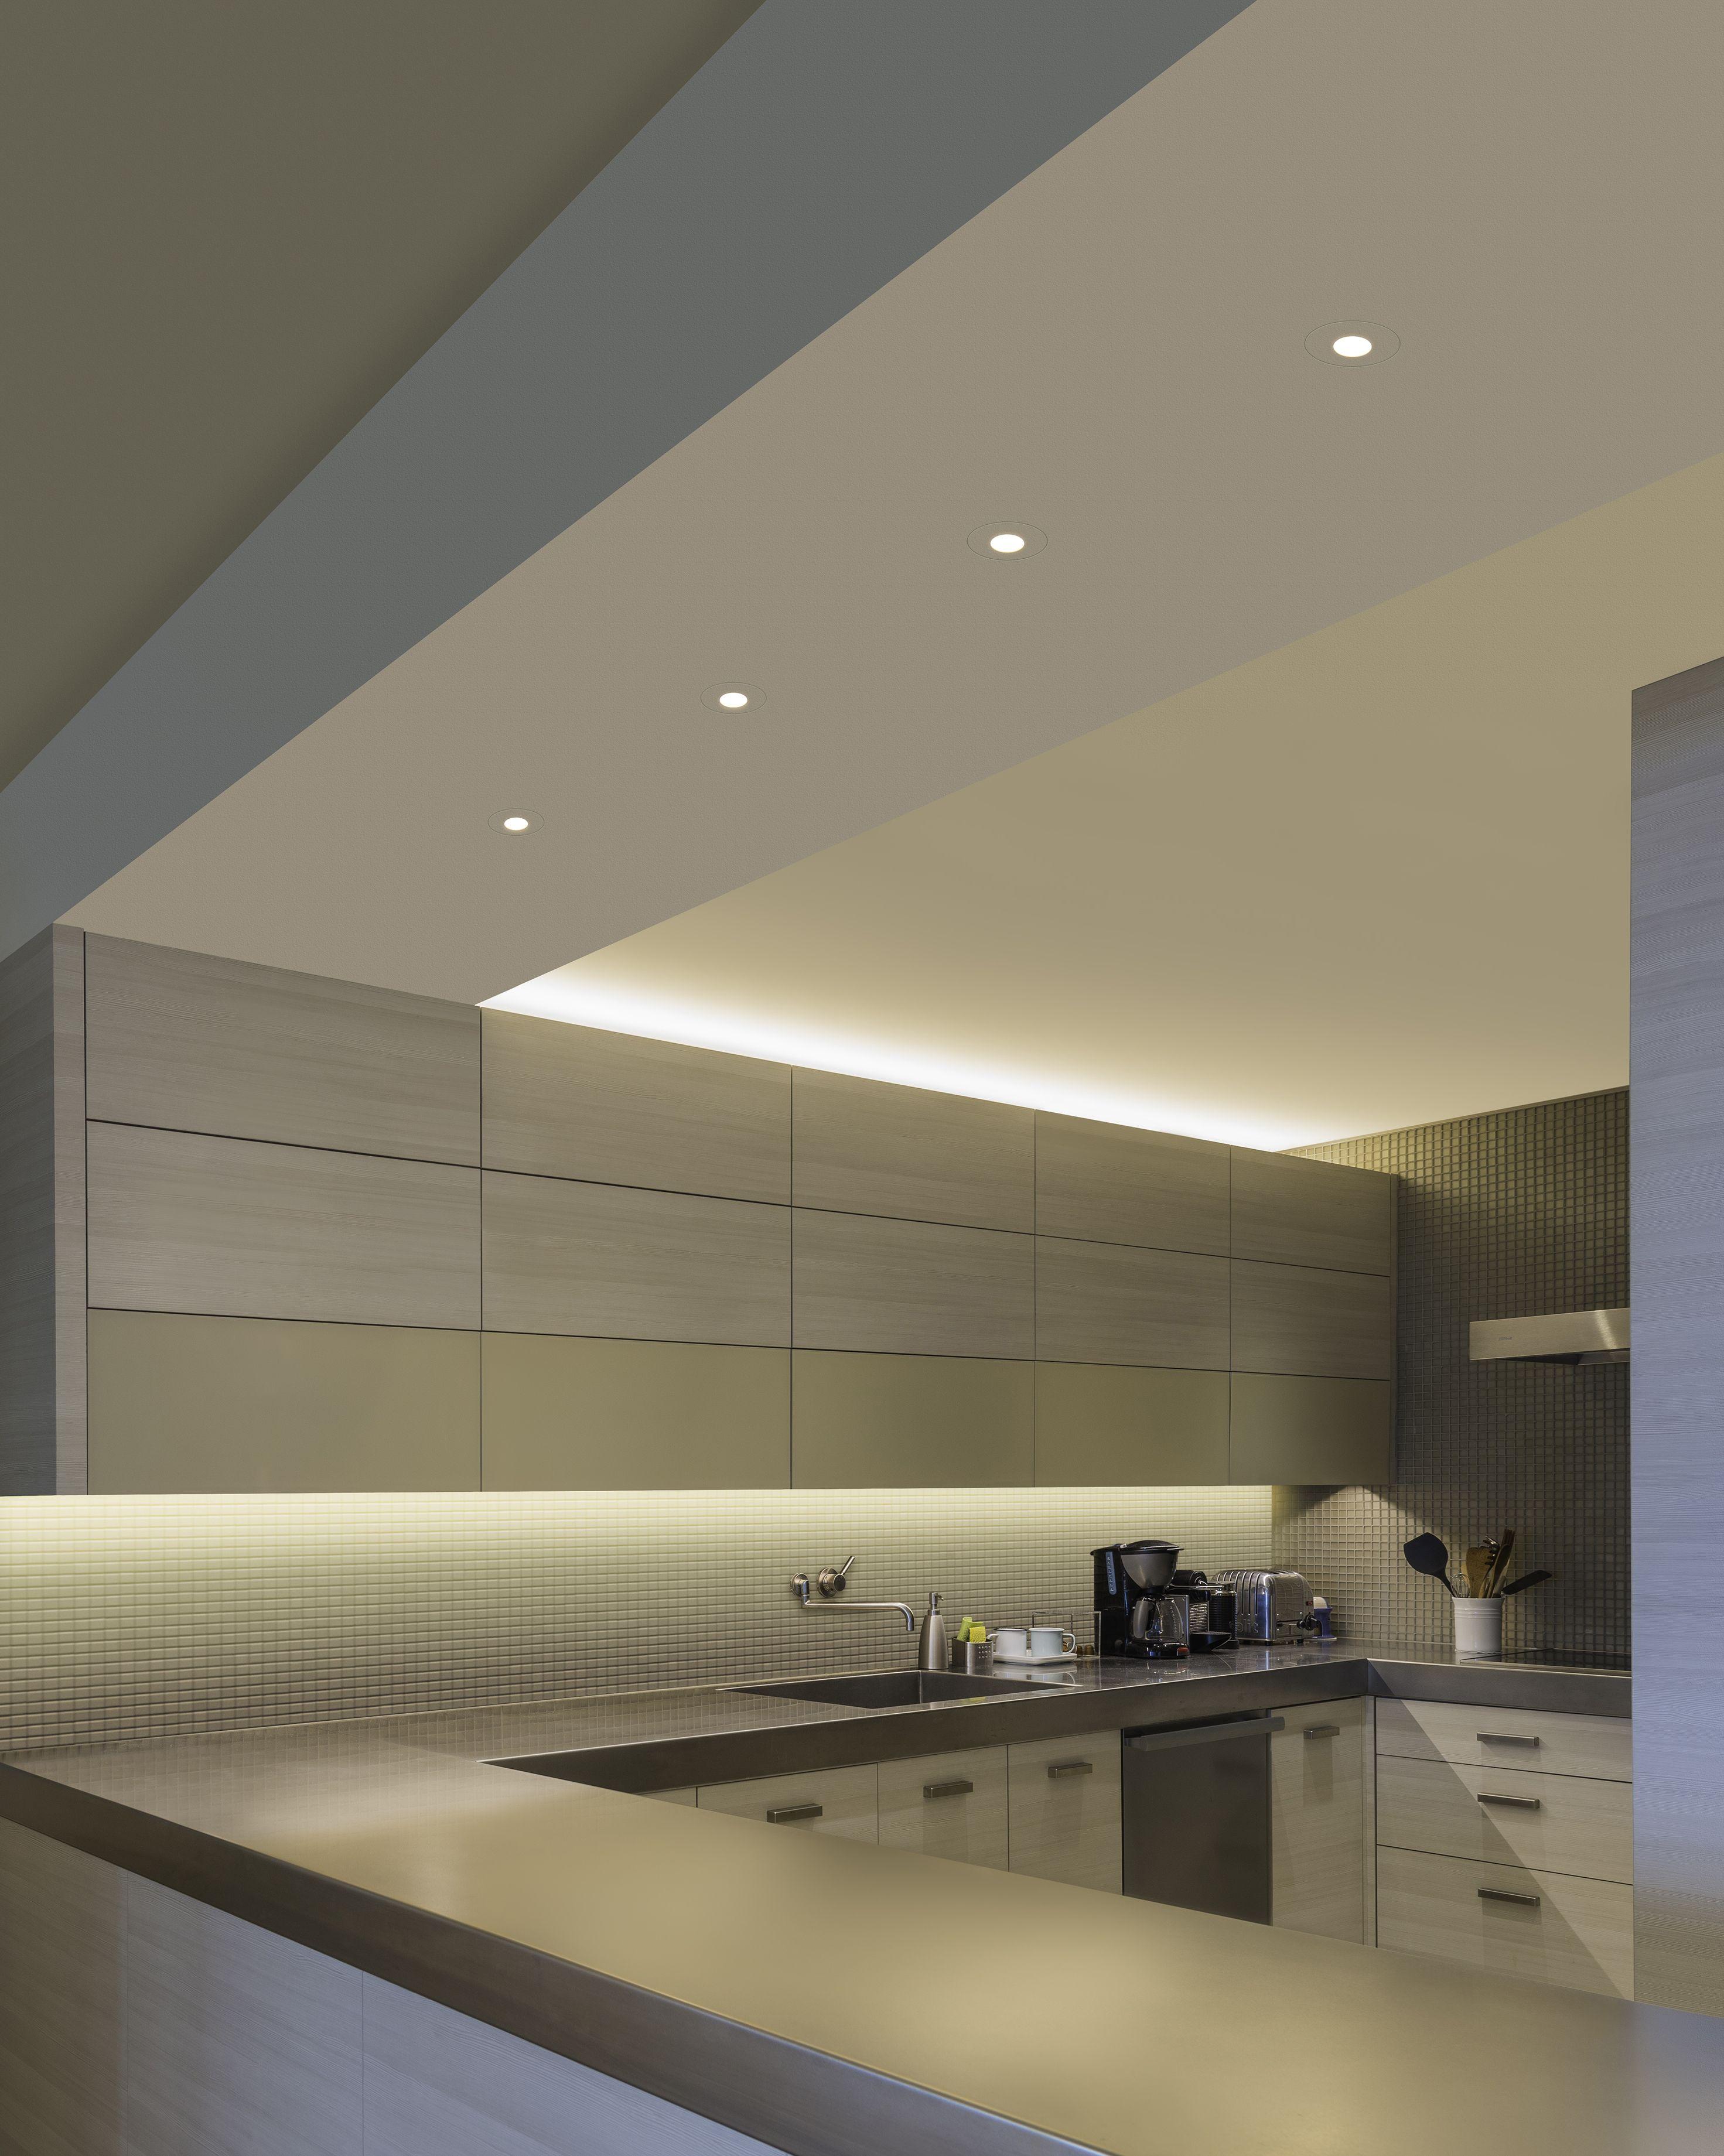 Aurora Round Edge 1.3 recessed LED accent light | Pure Lighting & Aurora Round Edge 1.3 recessed LED accent light | Pure Lighting ...